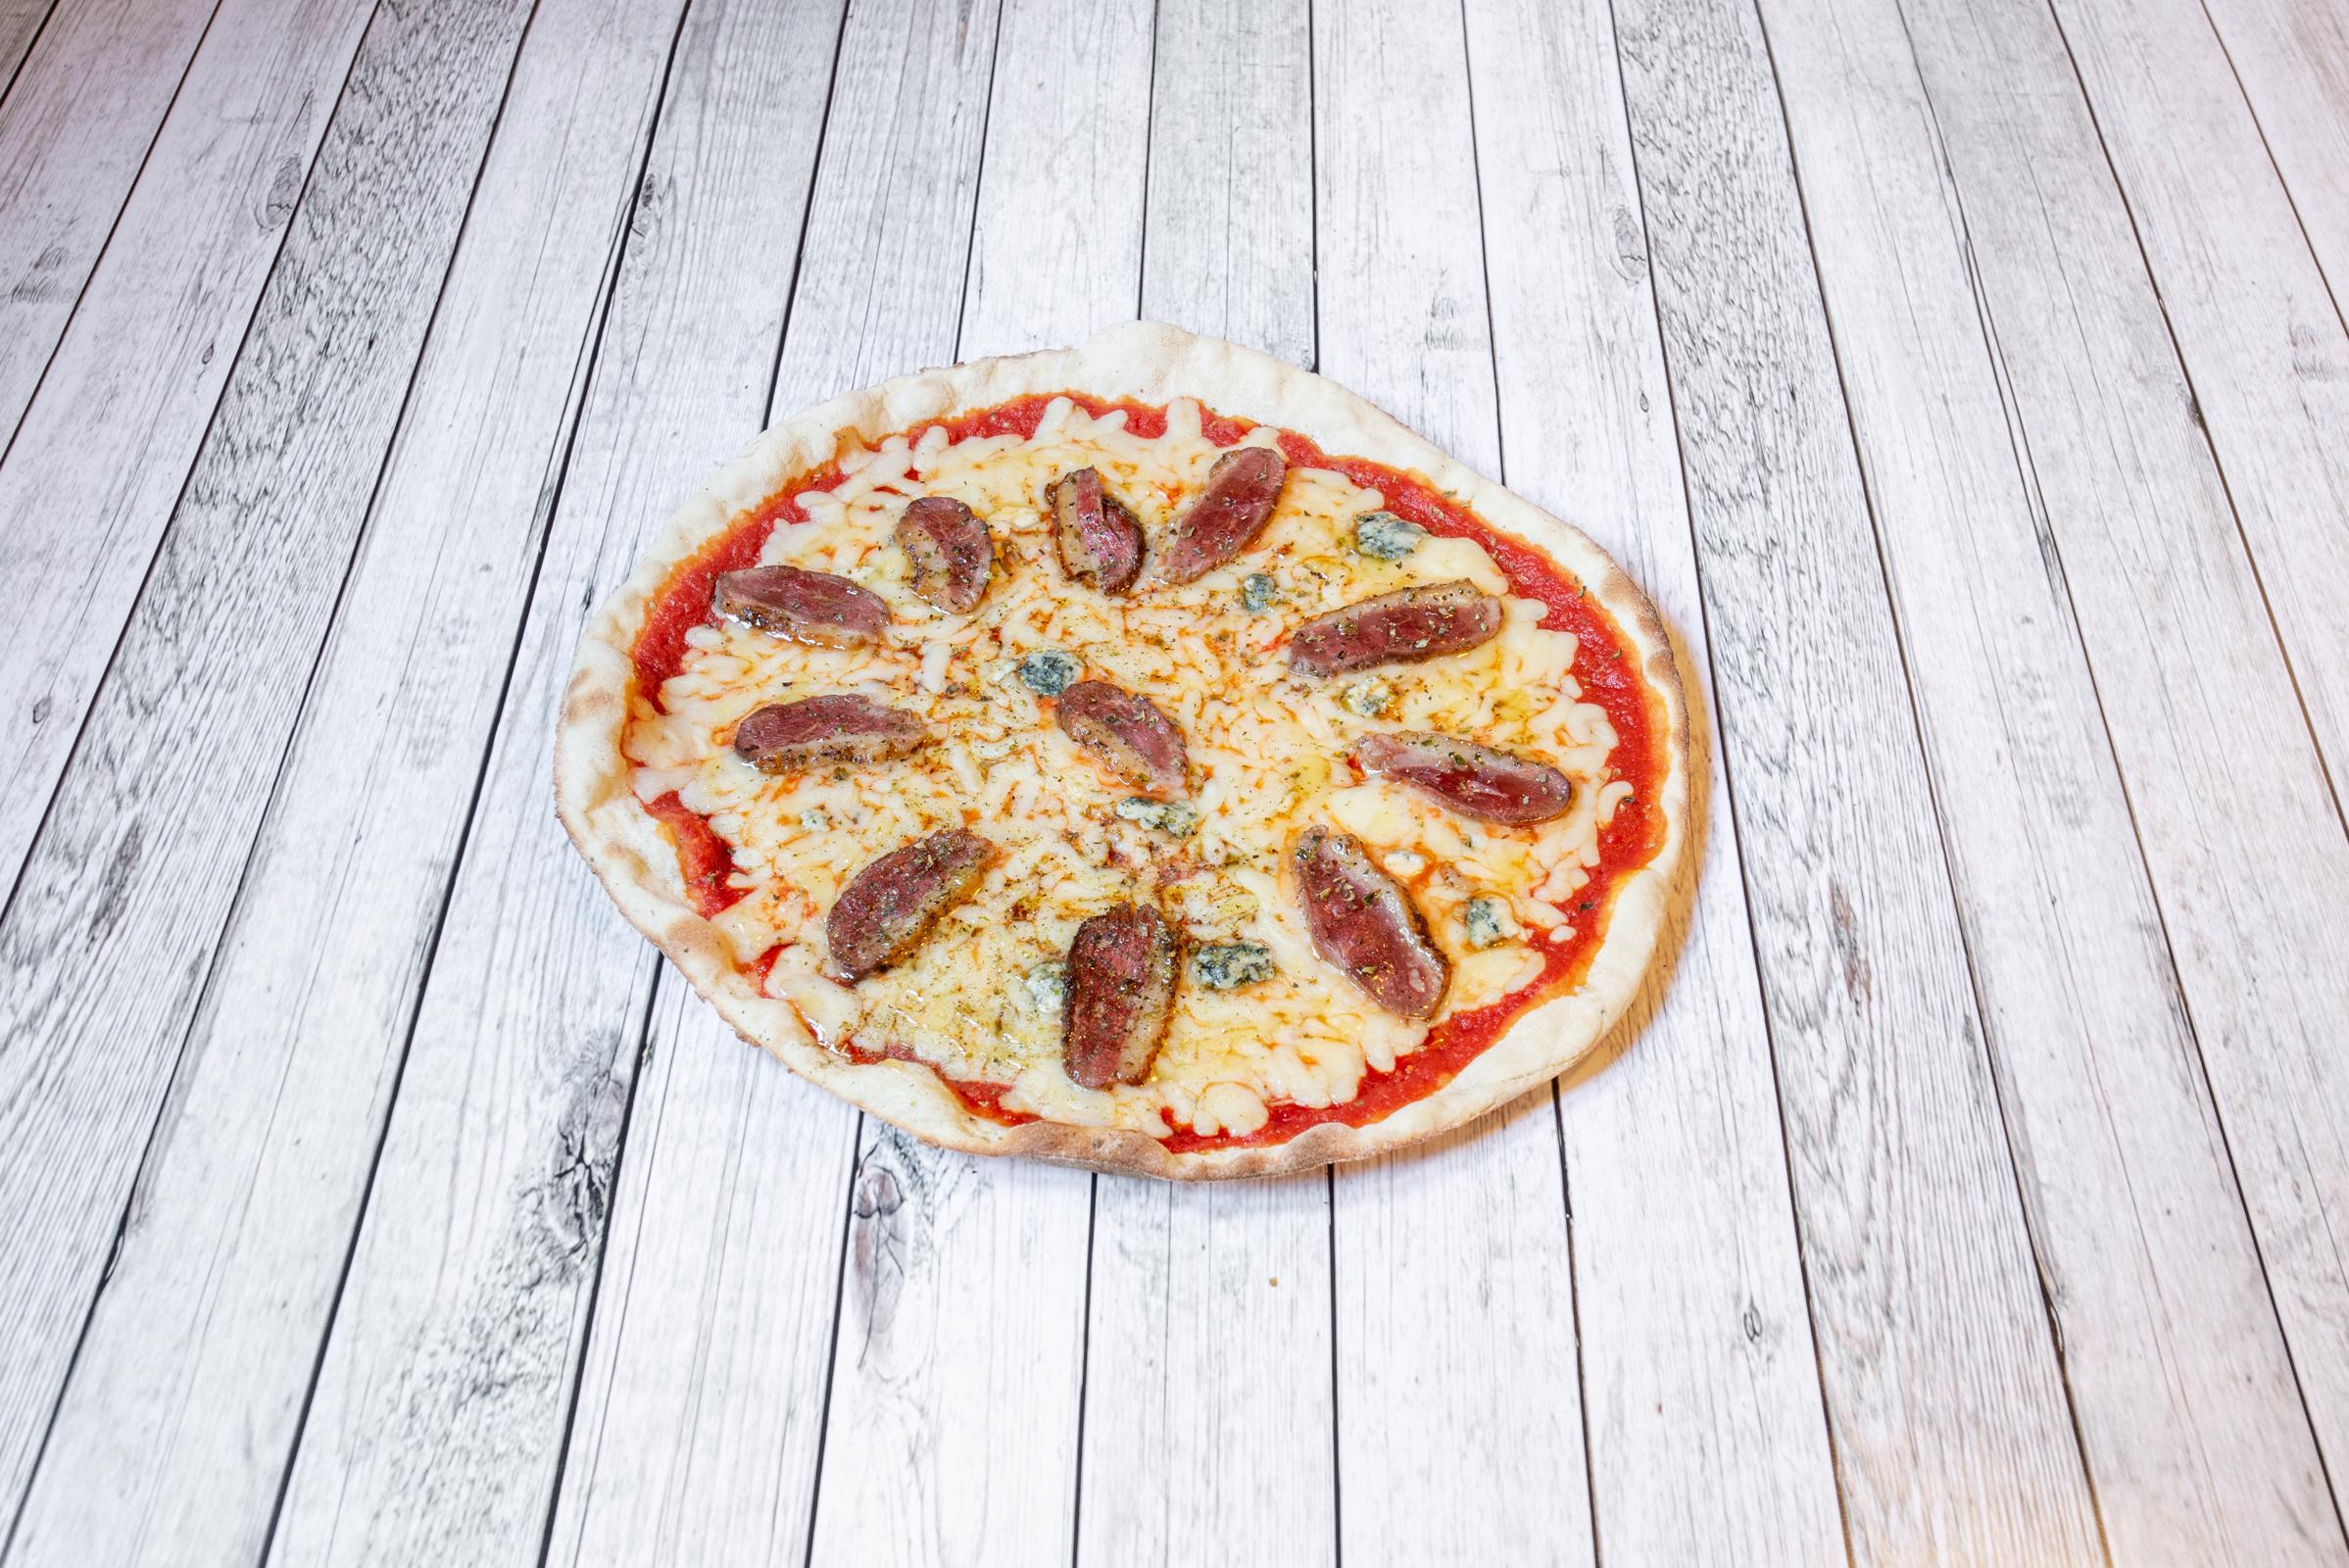 Zarabandas_Comida_PizzaMagret_foto1.jpg